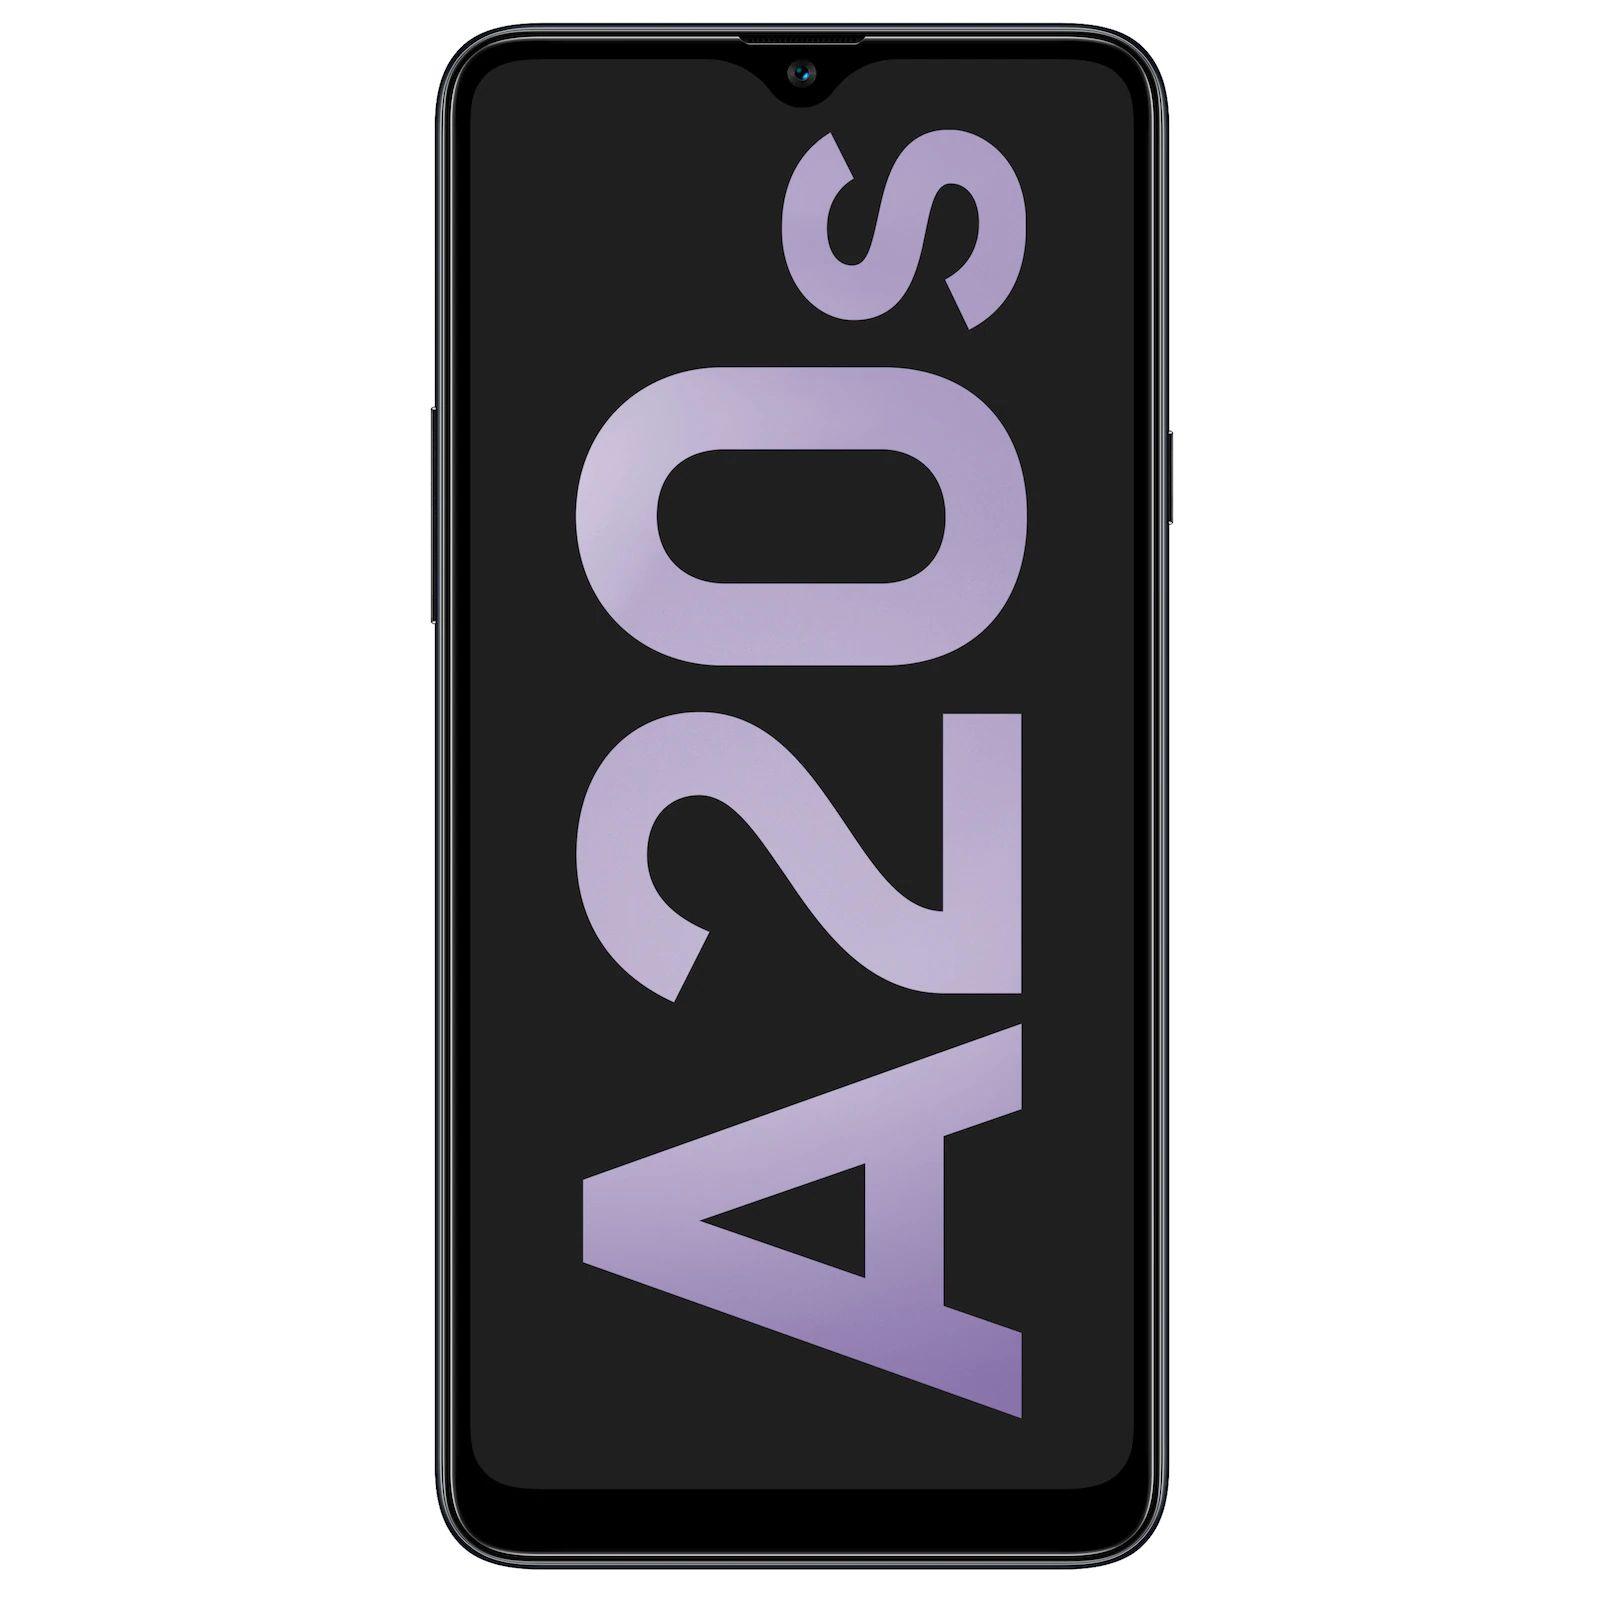 SamsungGalaxy A20s 32GB, Handy(Black, Dual SIM, Android 9.0 (Pie), 3 GB) [Aldi]